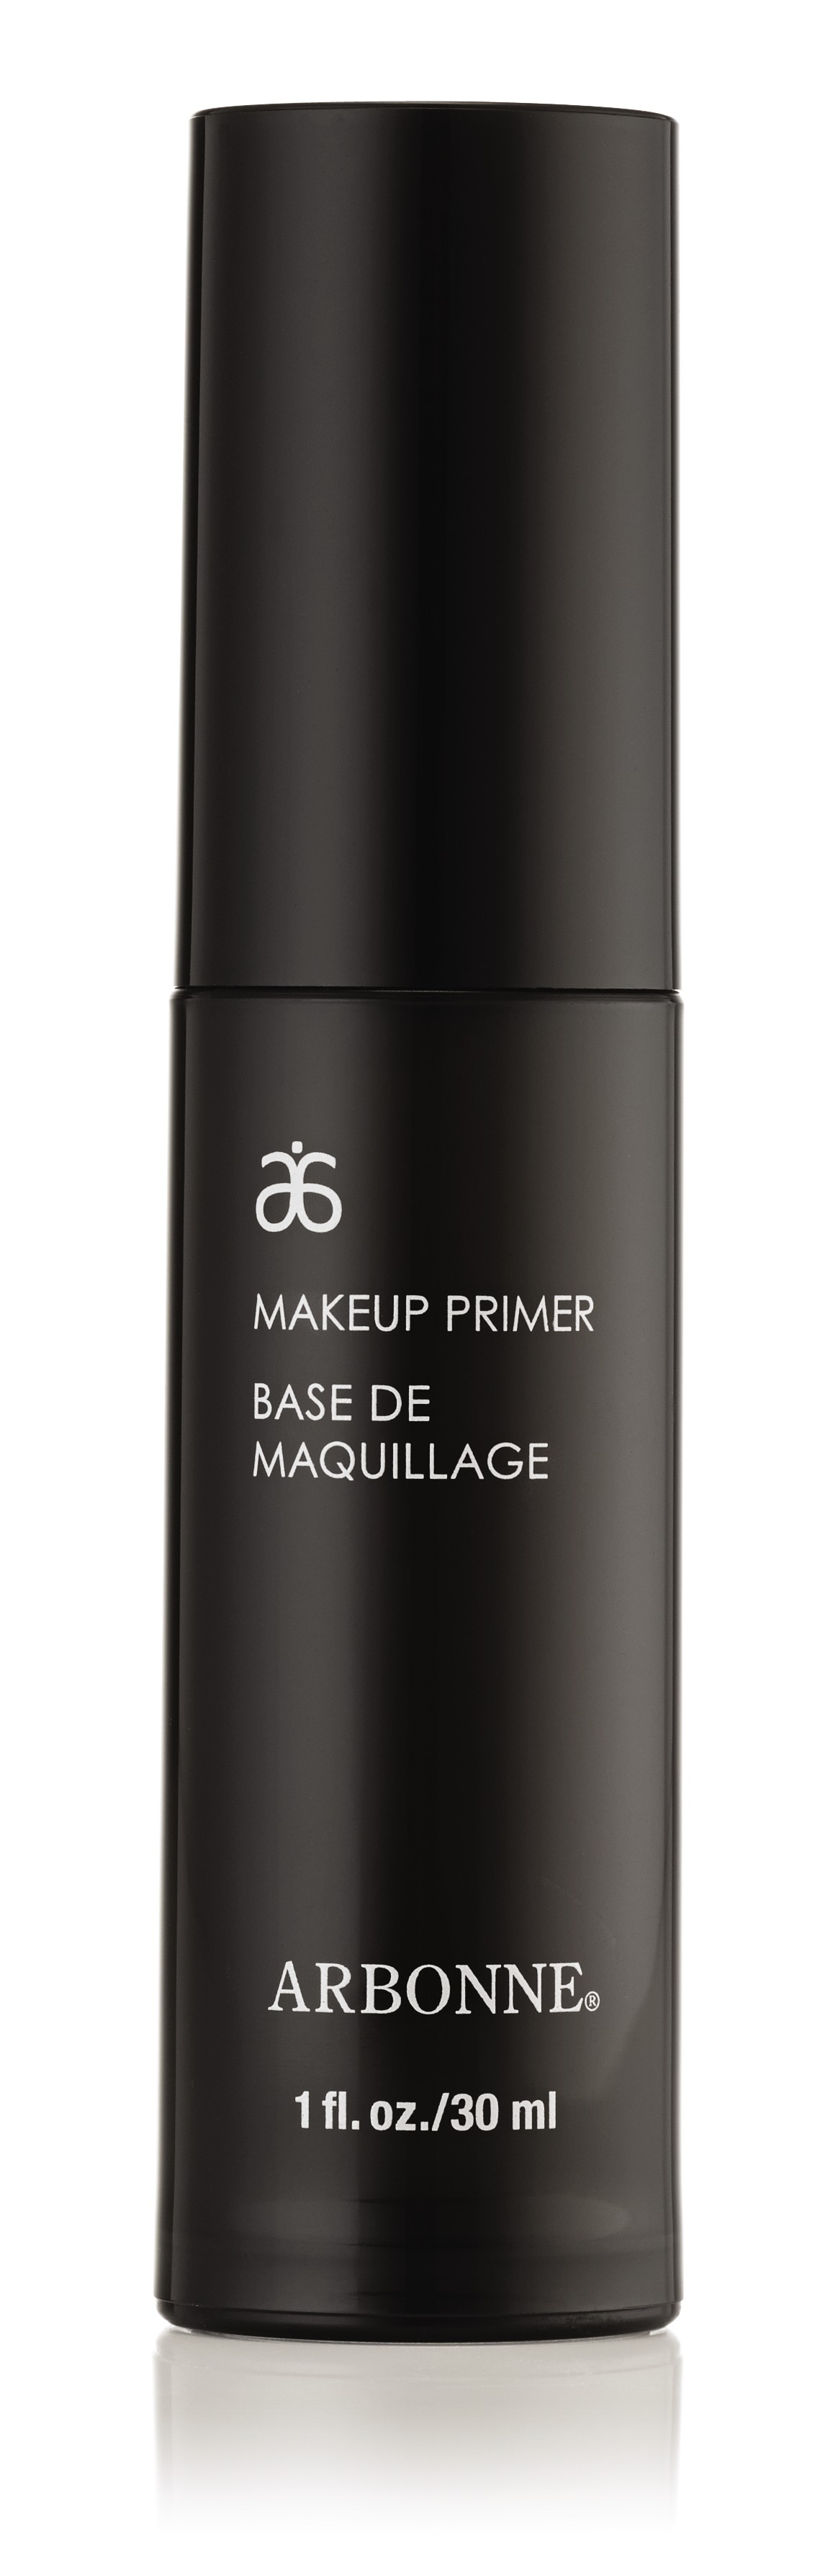 Arbonne Cosmetics Makeup Primer.jpg